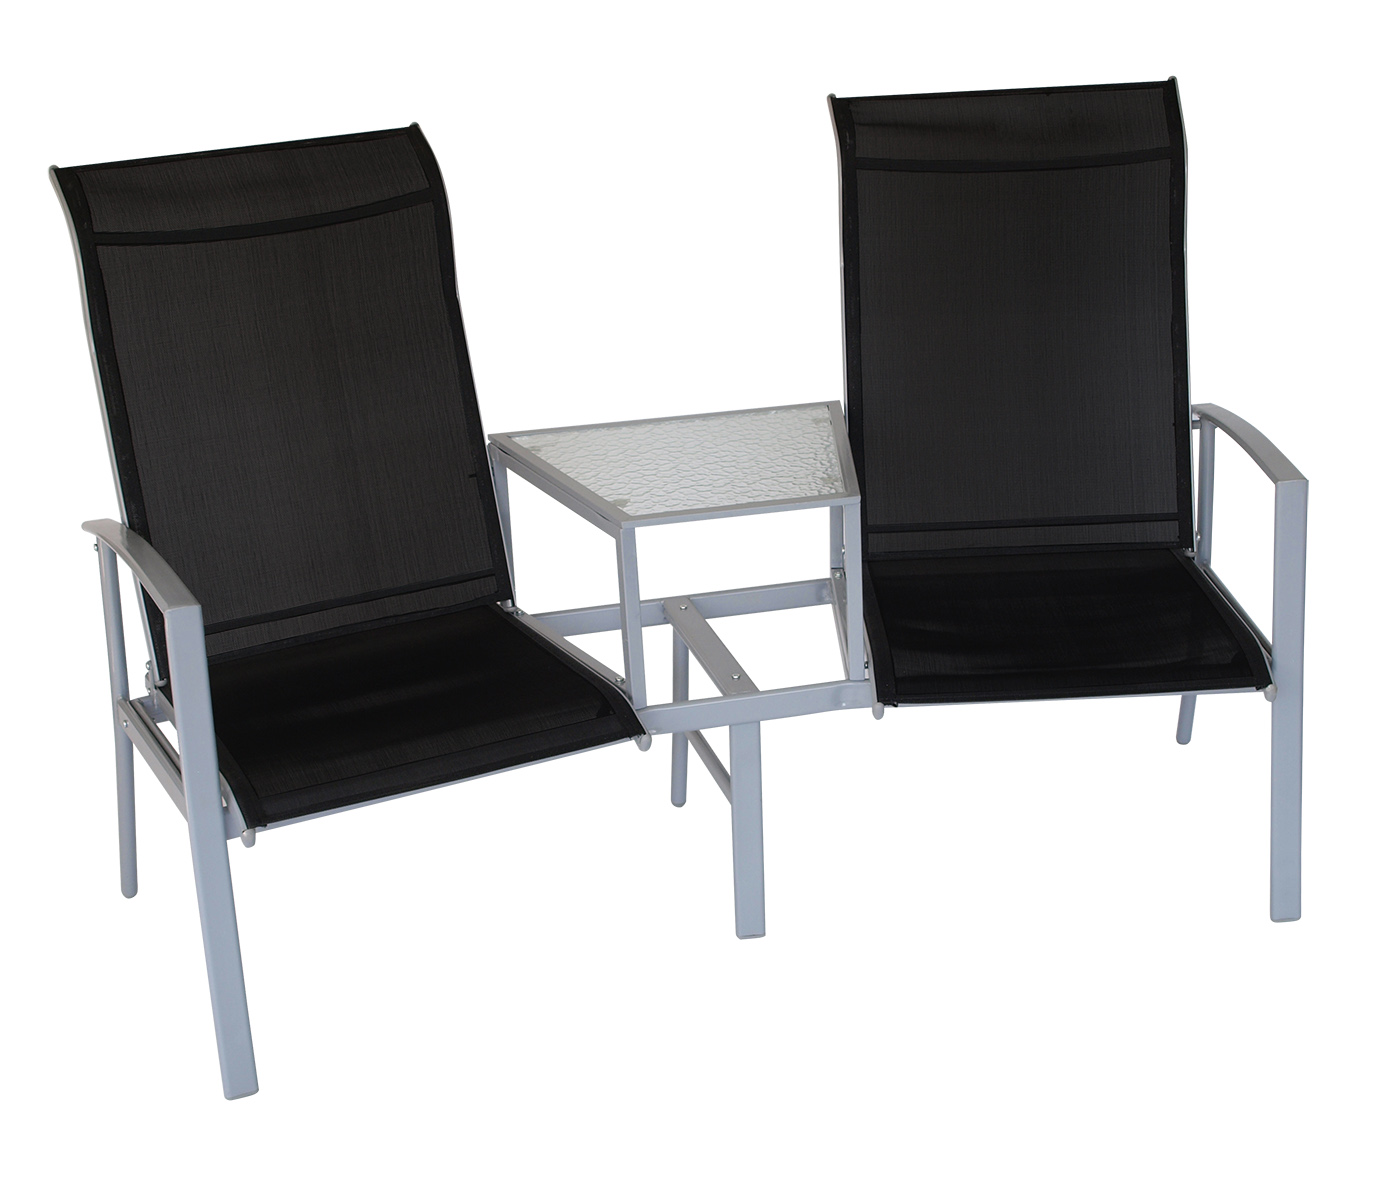 tete a tete bank gartenbank meran 2 sitz metall texilgewebe schwarz 2 wahl ebay. Black Bedroom Furniture Sets. Home Design Ideas